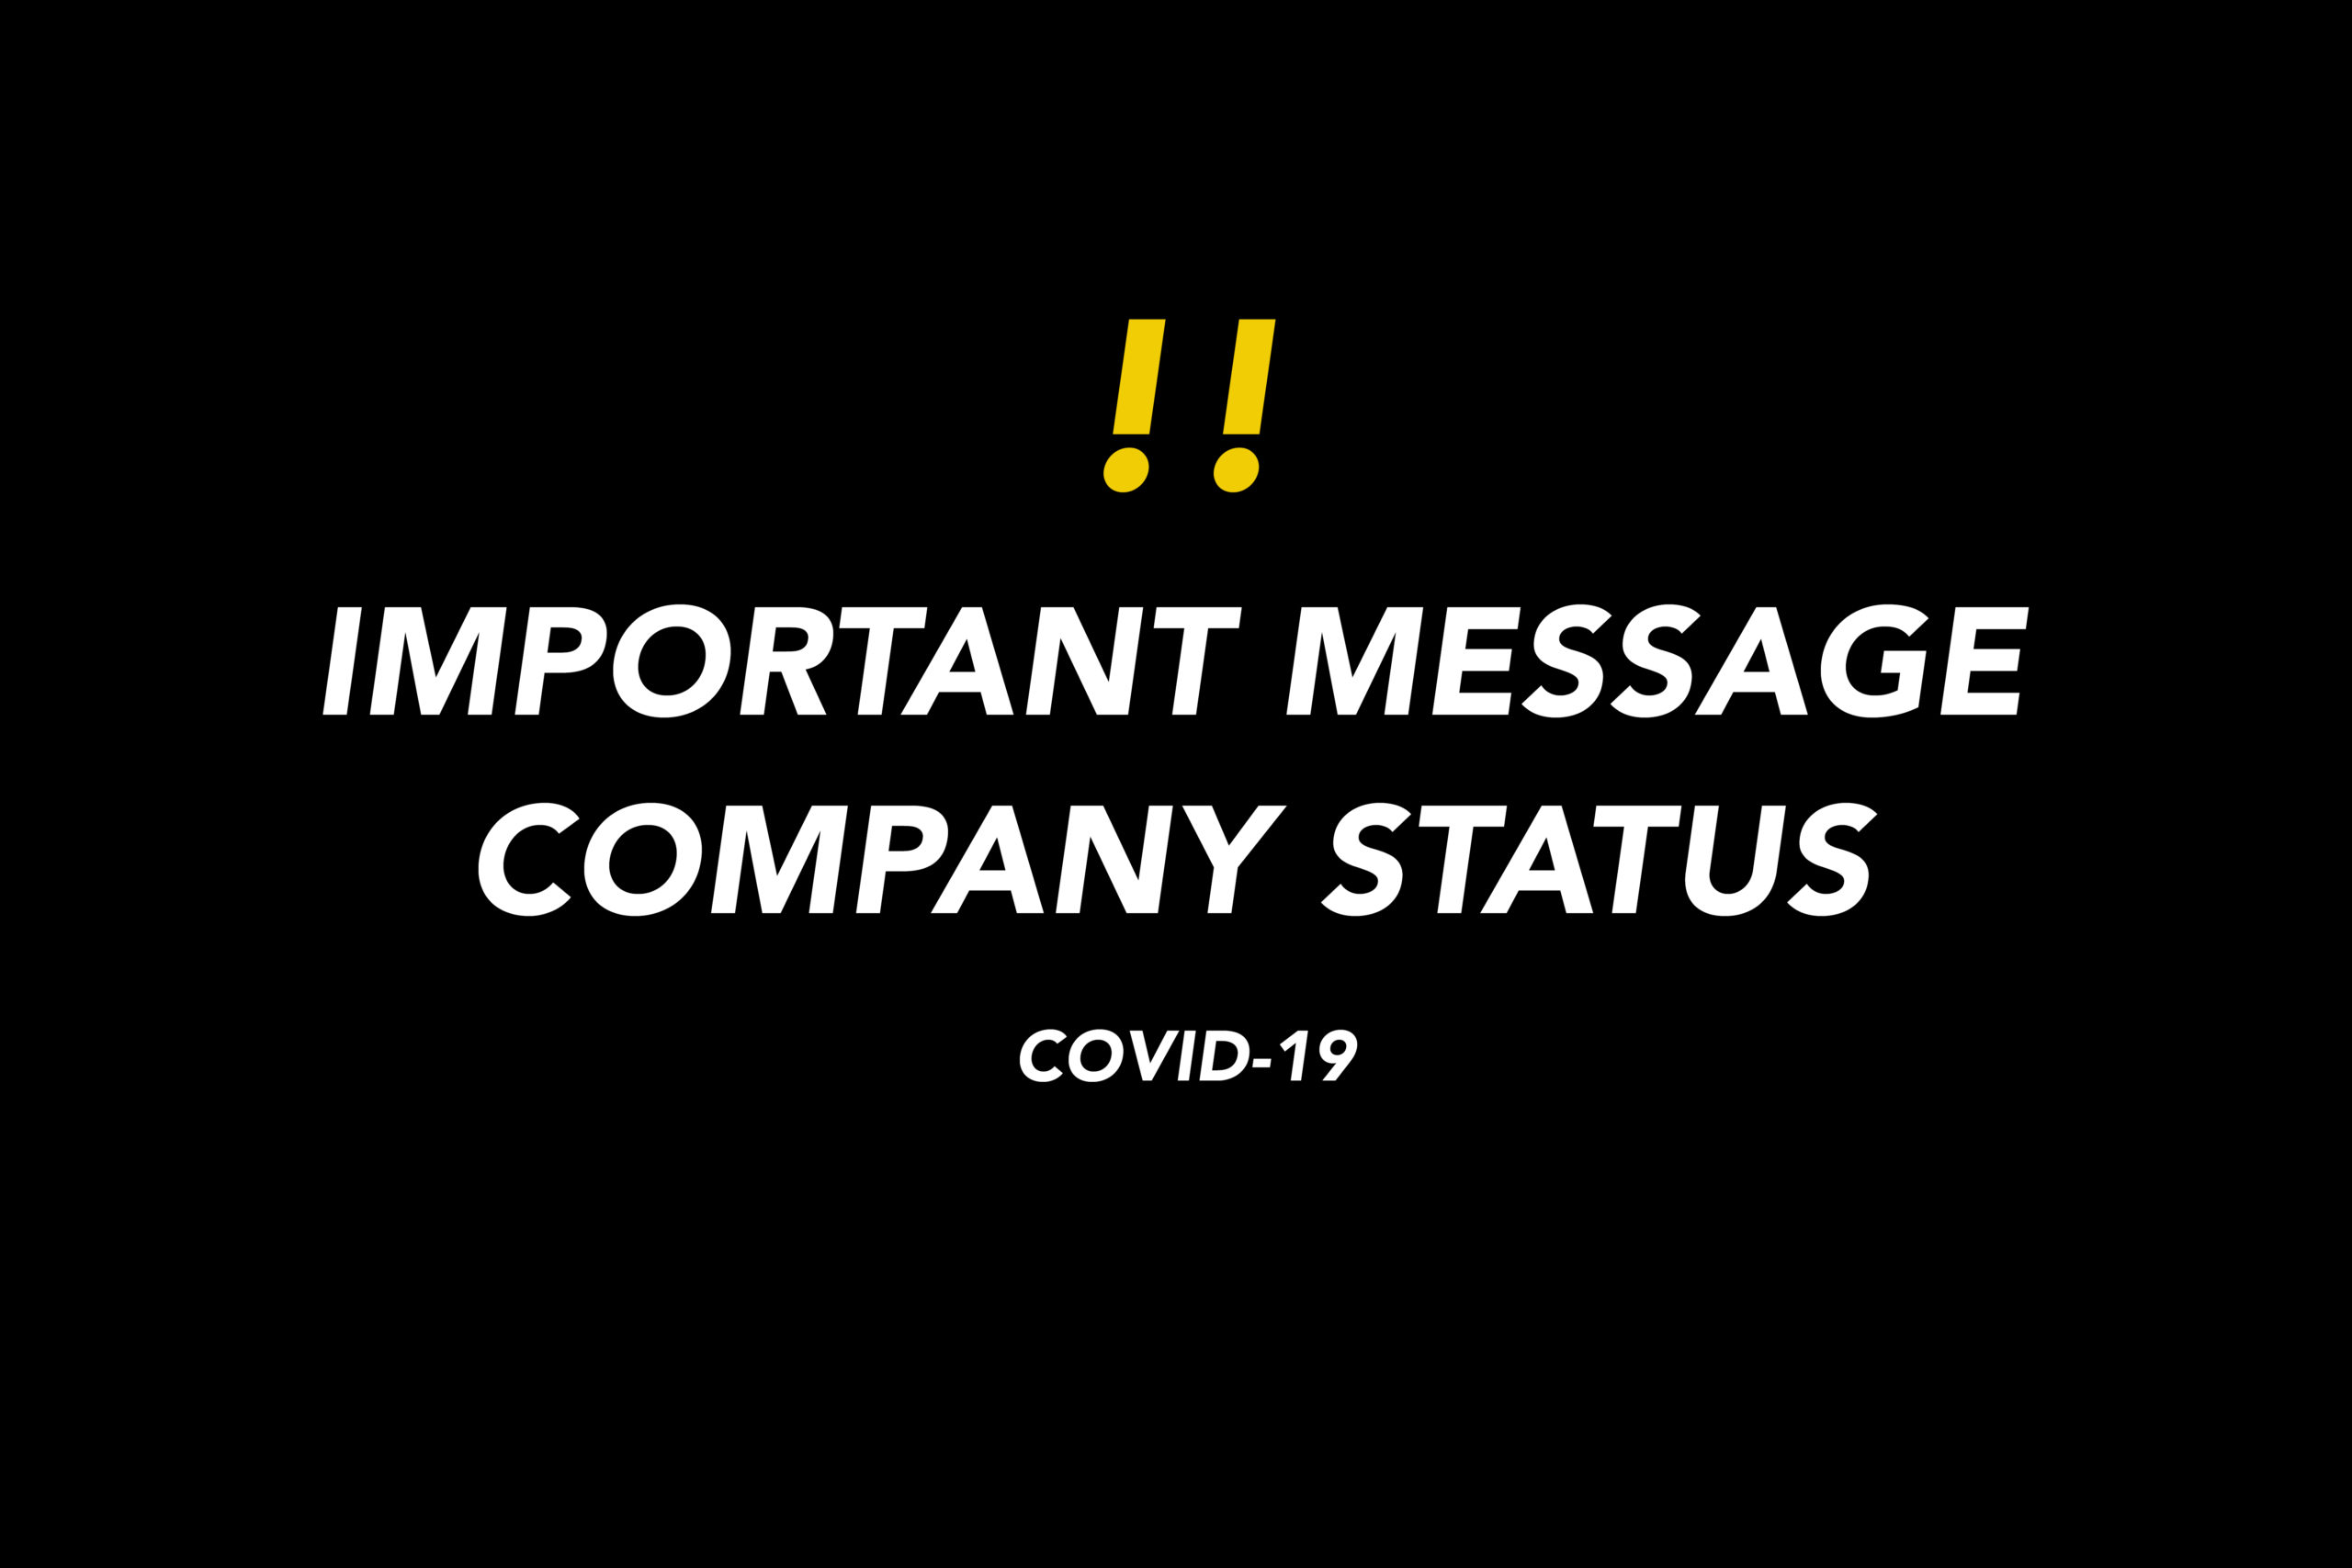 AVIS IMPORTANT COVID-19